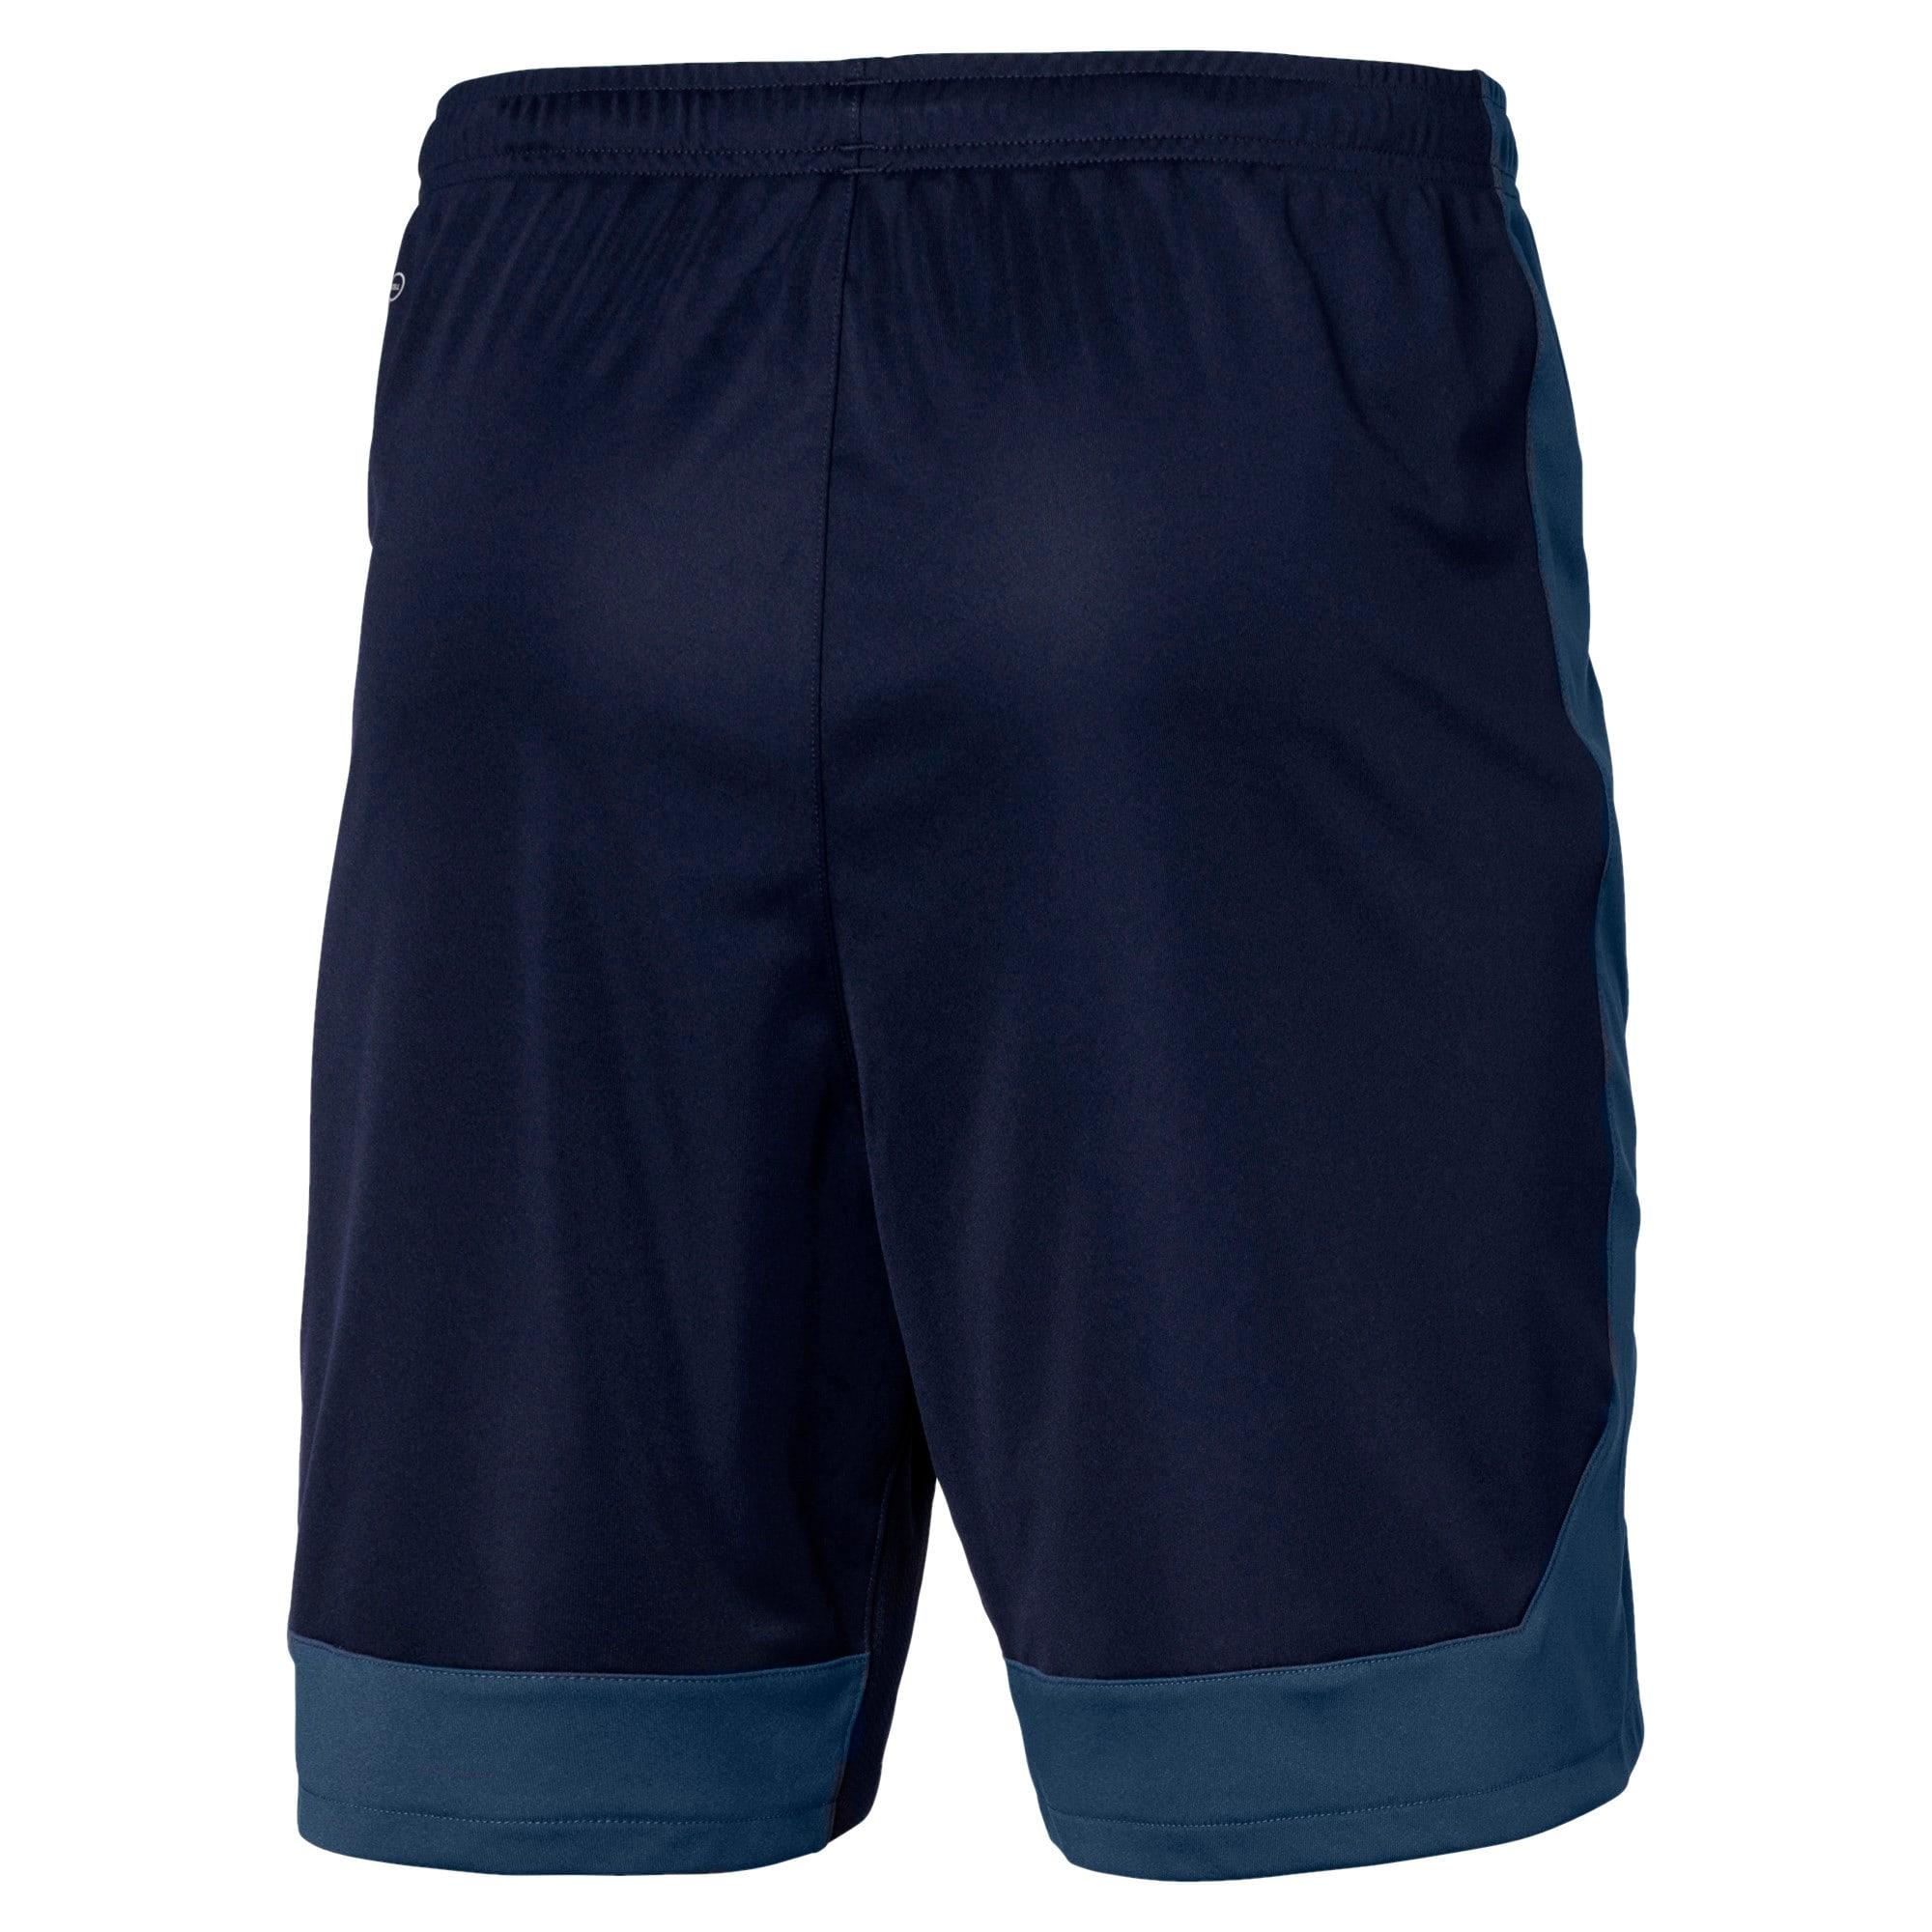 Thumbnail 4 of ftblNXT Men's Training Shorts, Peacoat-Dark Denim, medium